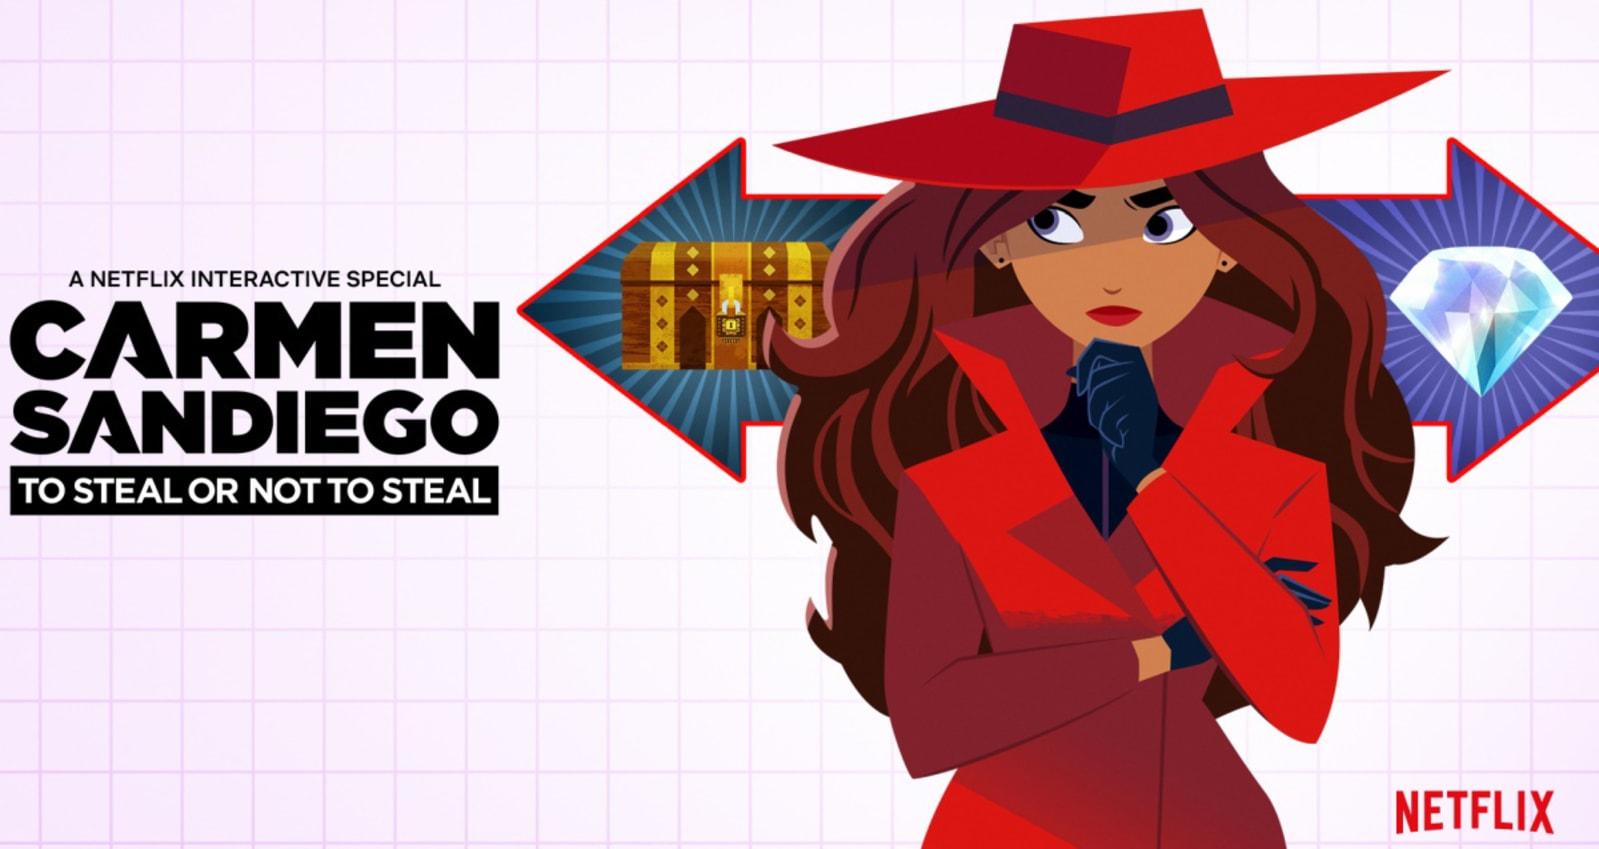 Netflix previews interactive 'Carmen Sandiego' special